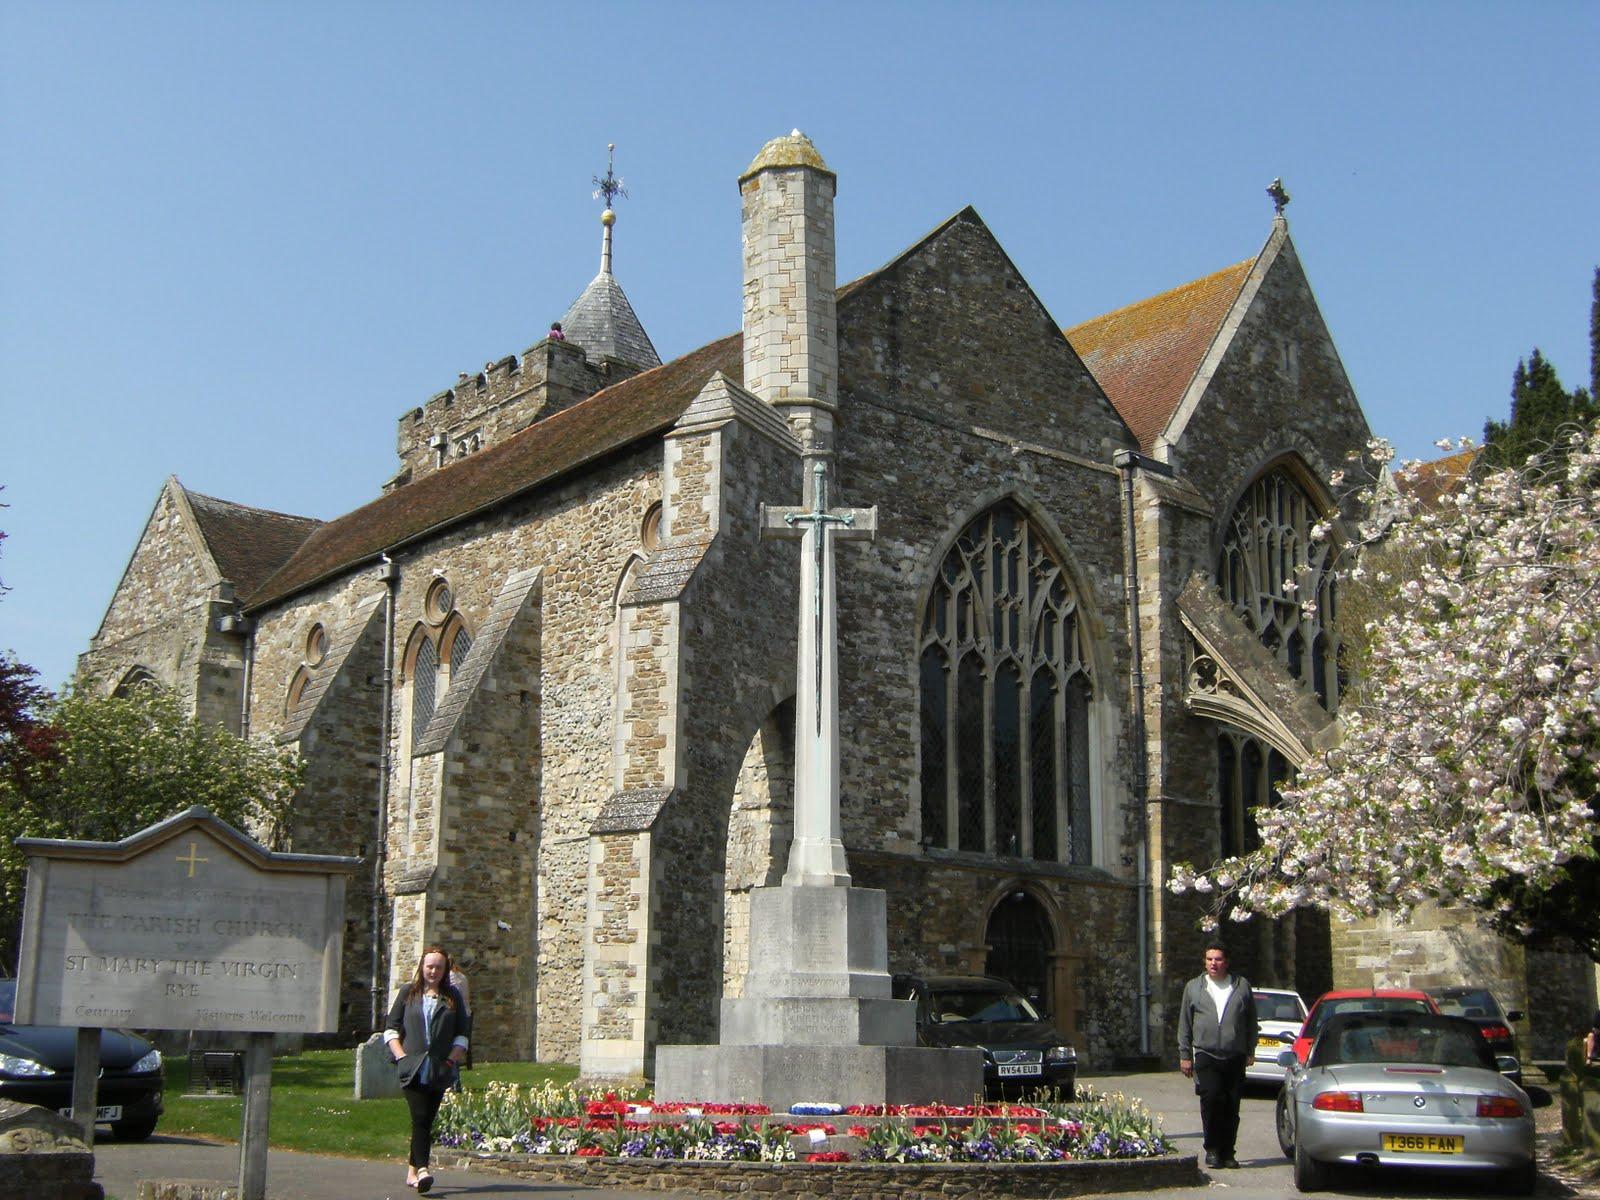 DSCF7350 St Mary the Virgin Church, Rye